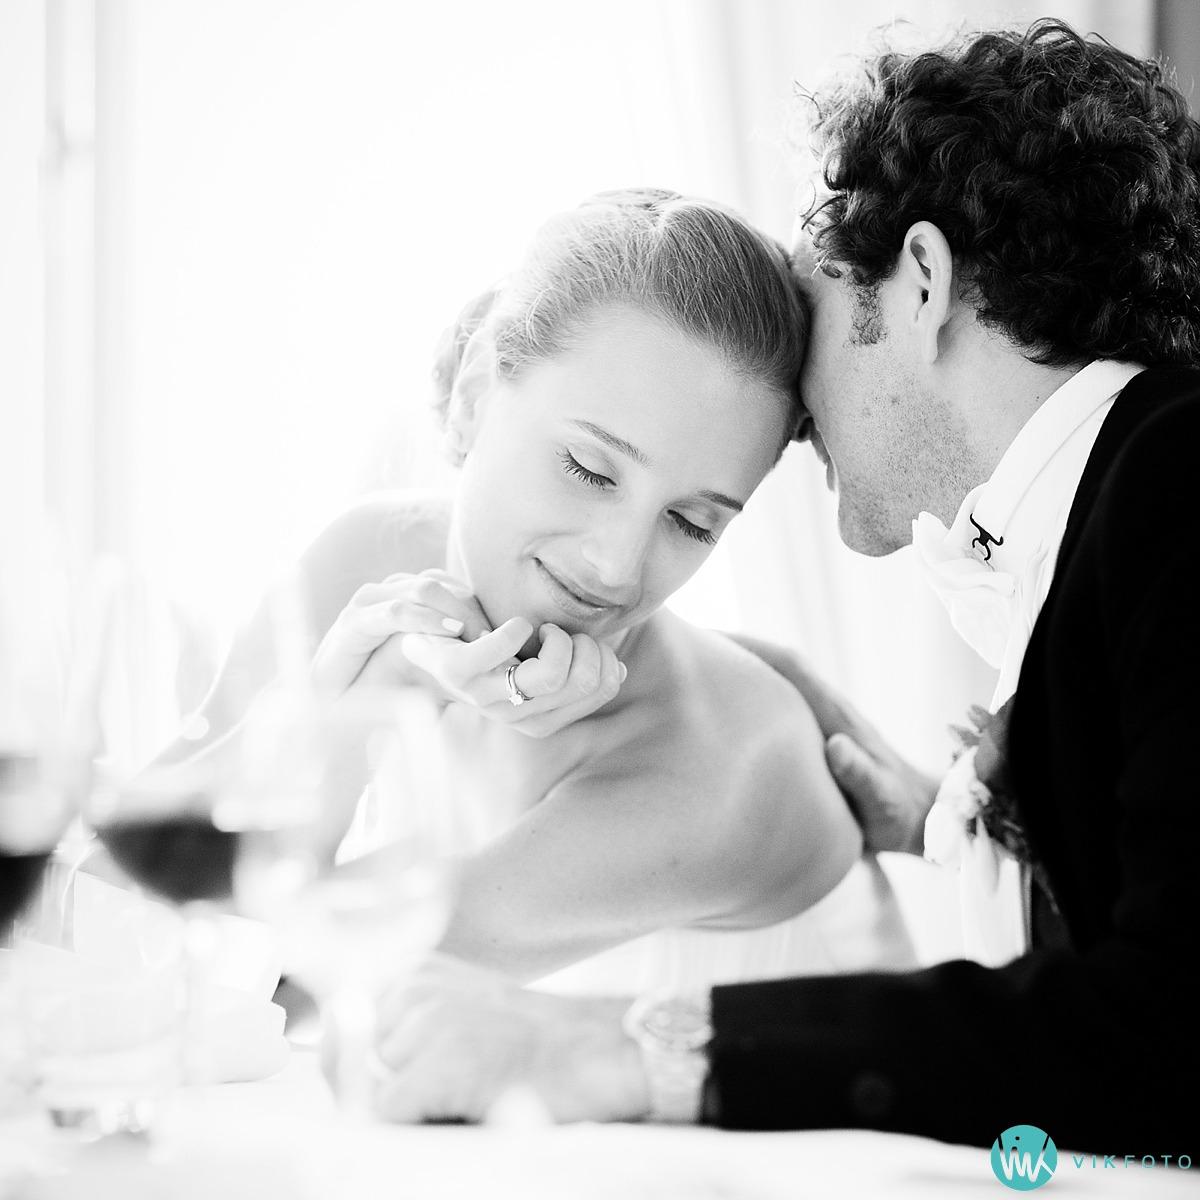 10-fotograf-bryllup-moss-radio-jely.jpg